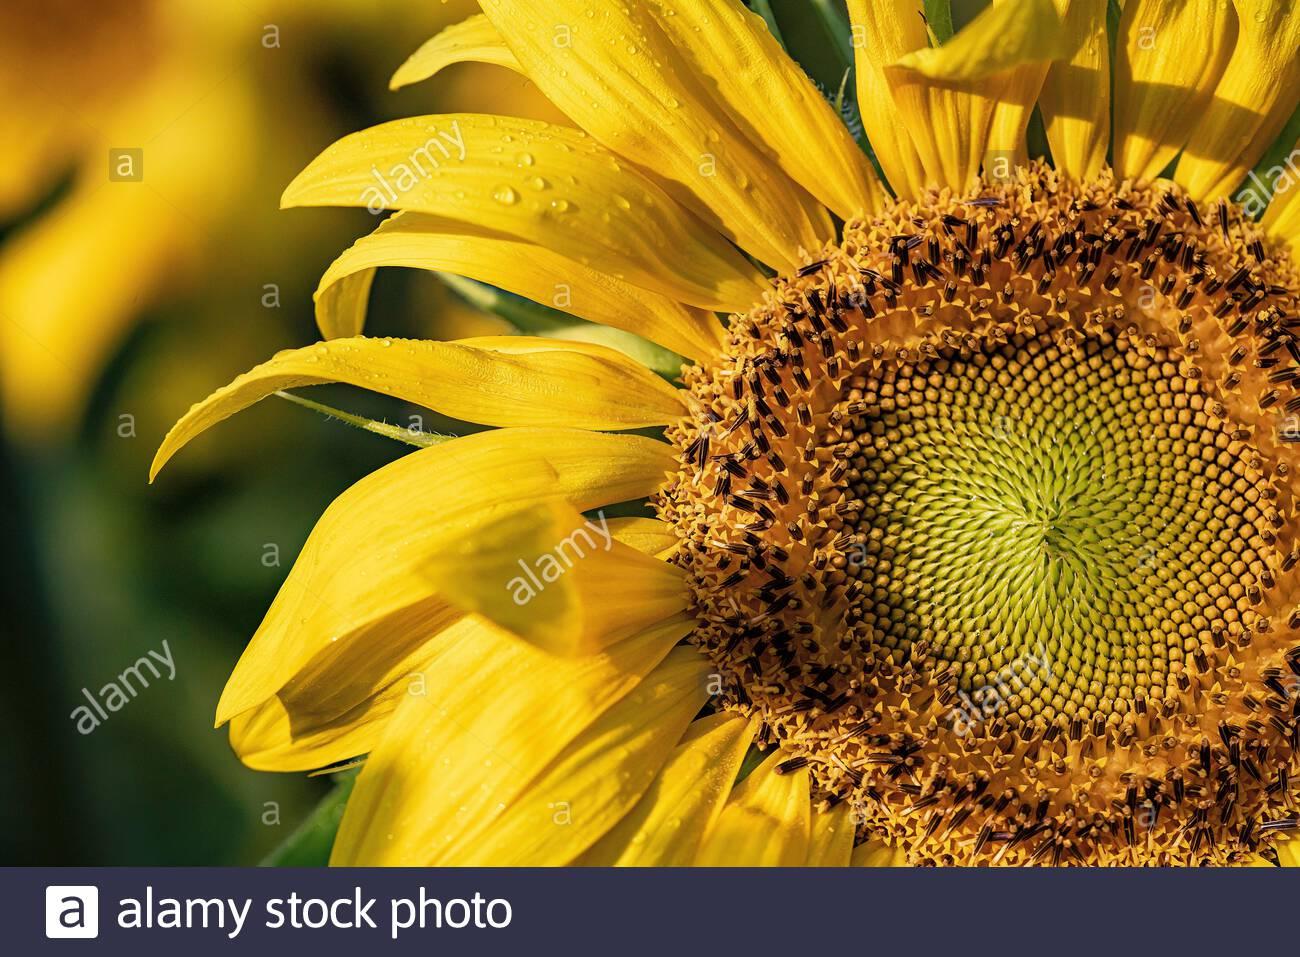 sunflower-helianthus-annuus-2C9888E.jpg